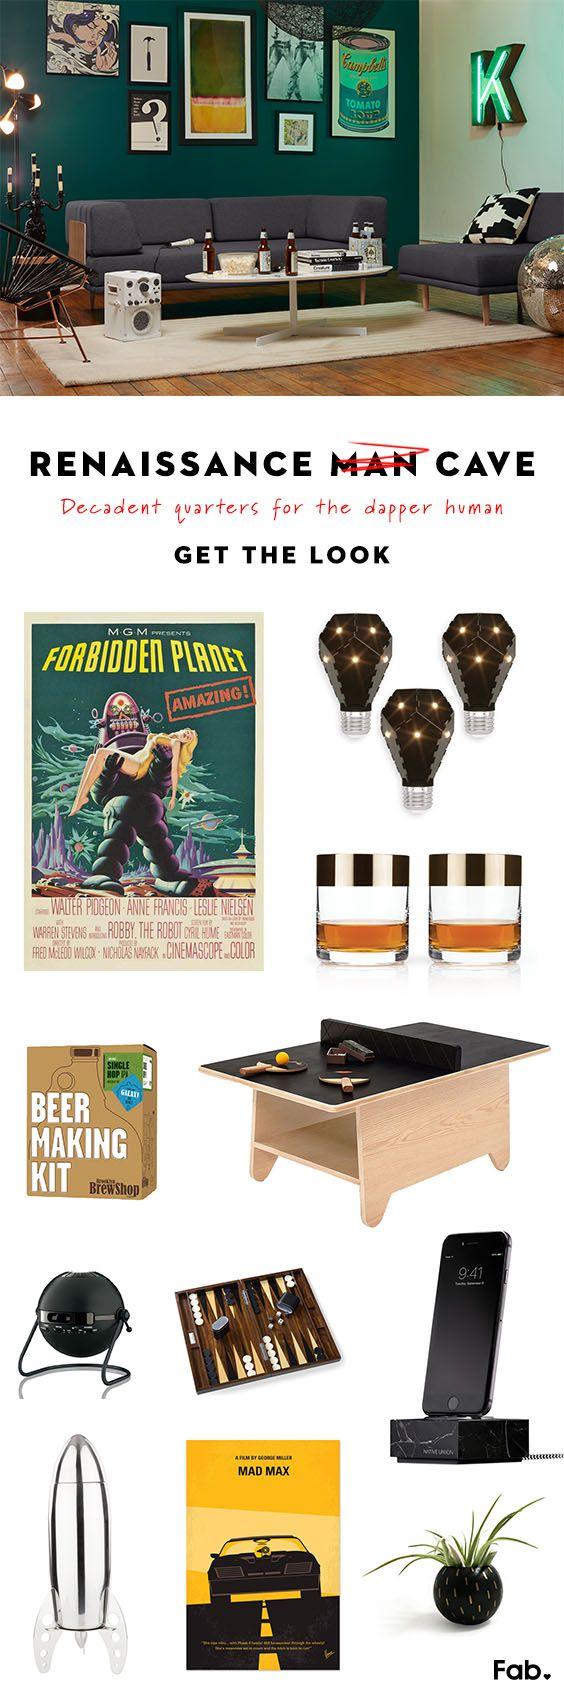 The Man Cave Essentials : The best man cave essentials ideas on pinterest